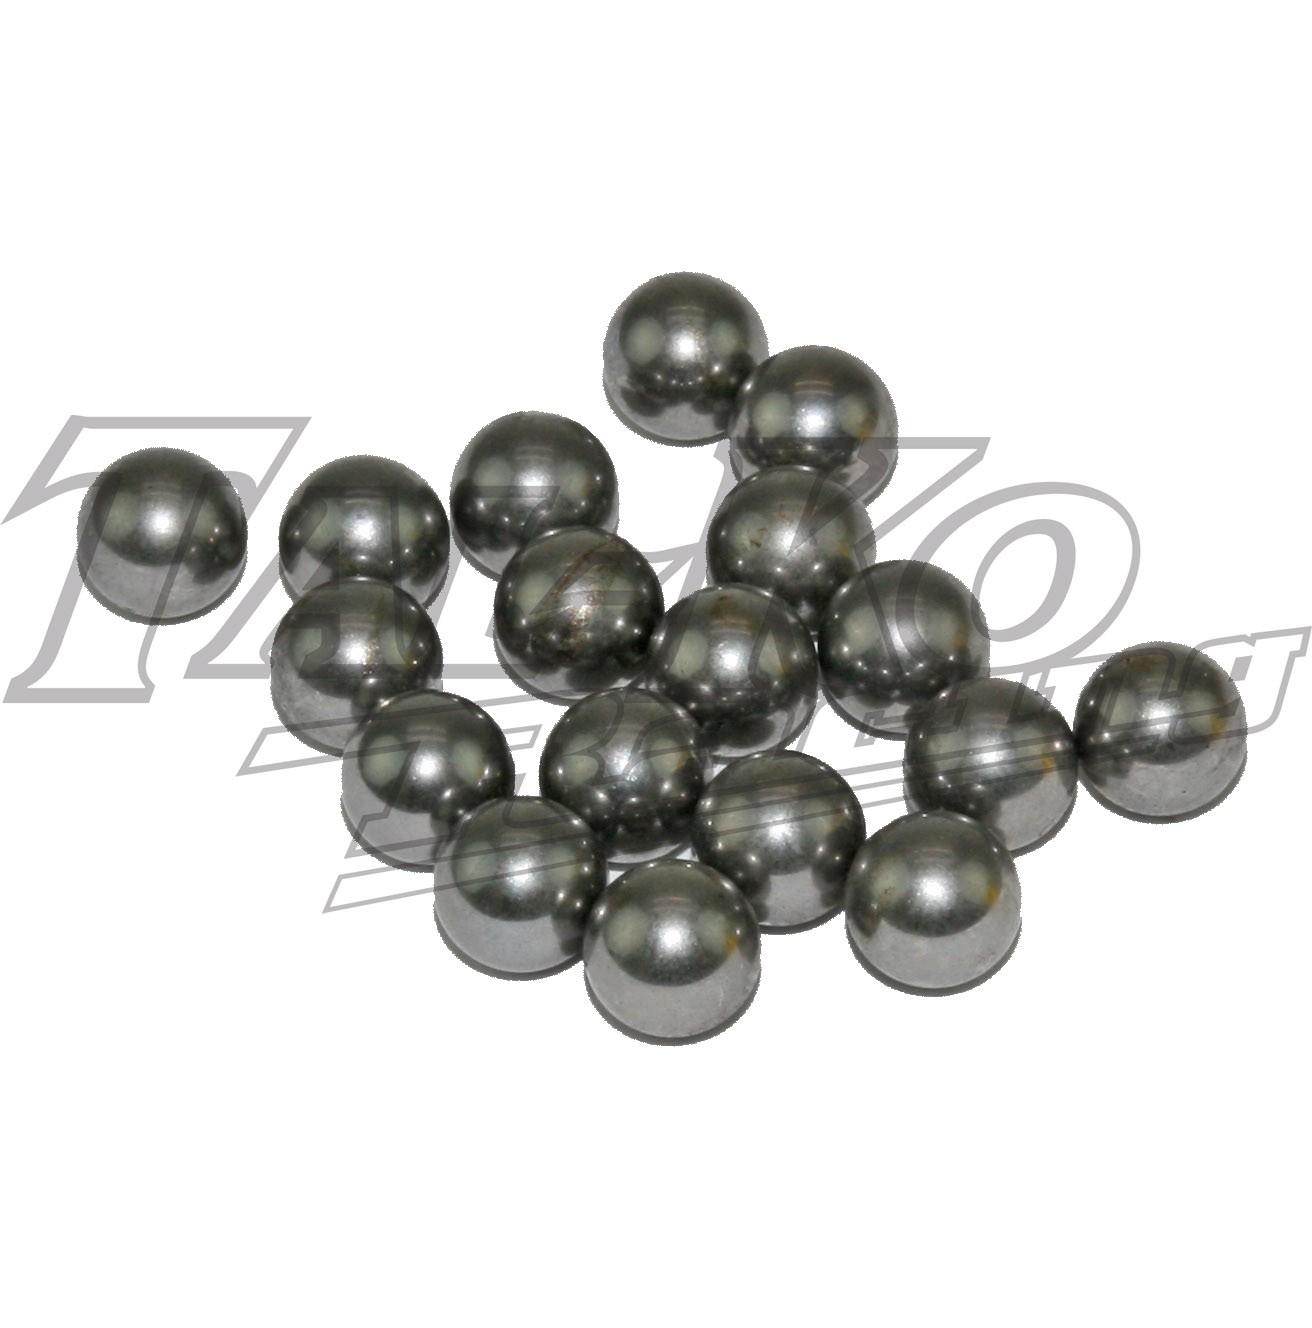 TKM K4S CLUTCH BALL BEARING 12mm SET 18